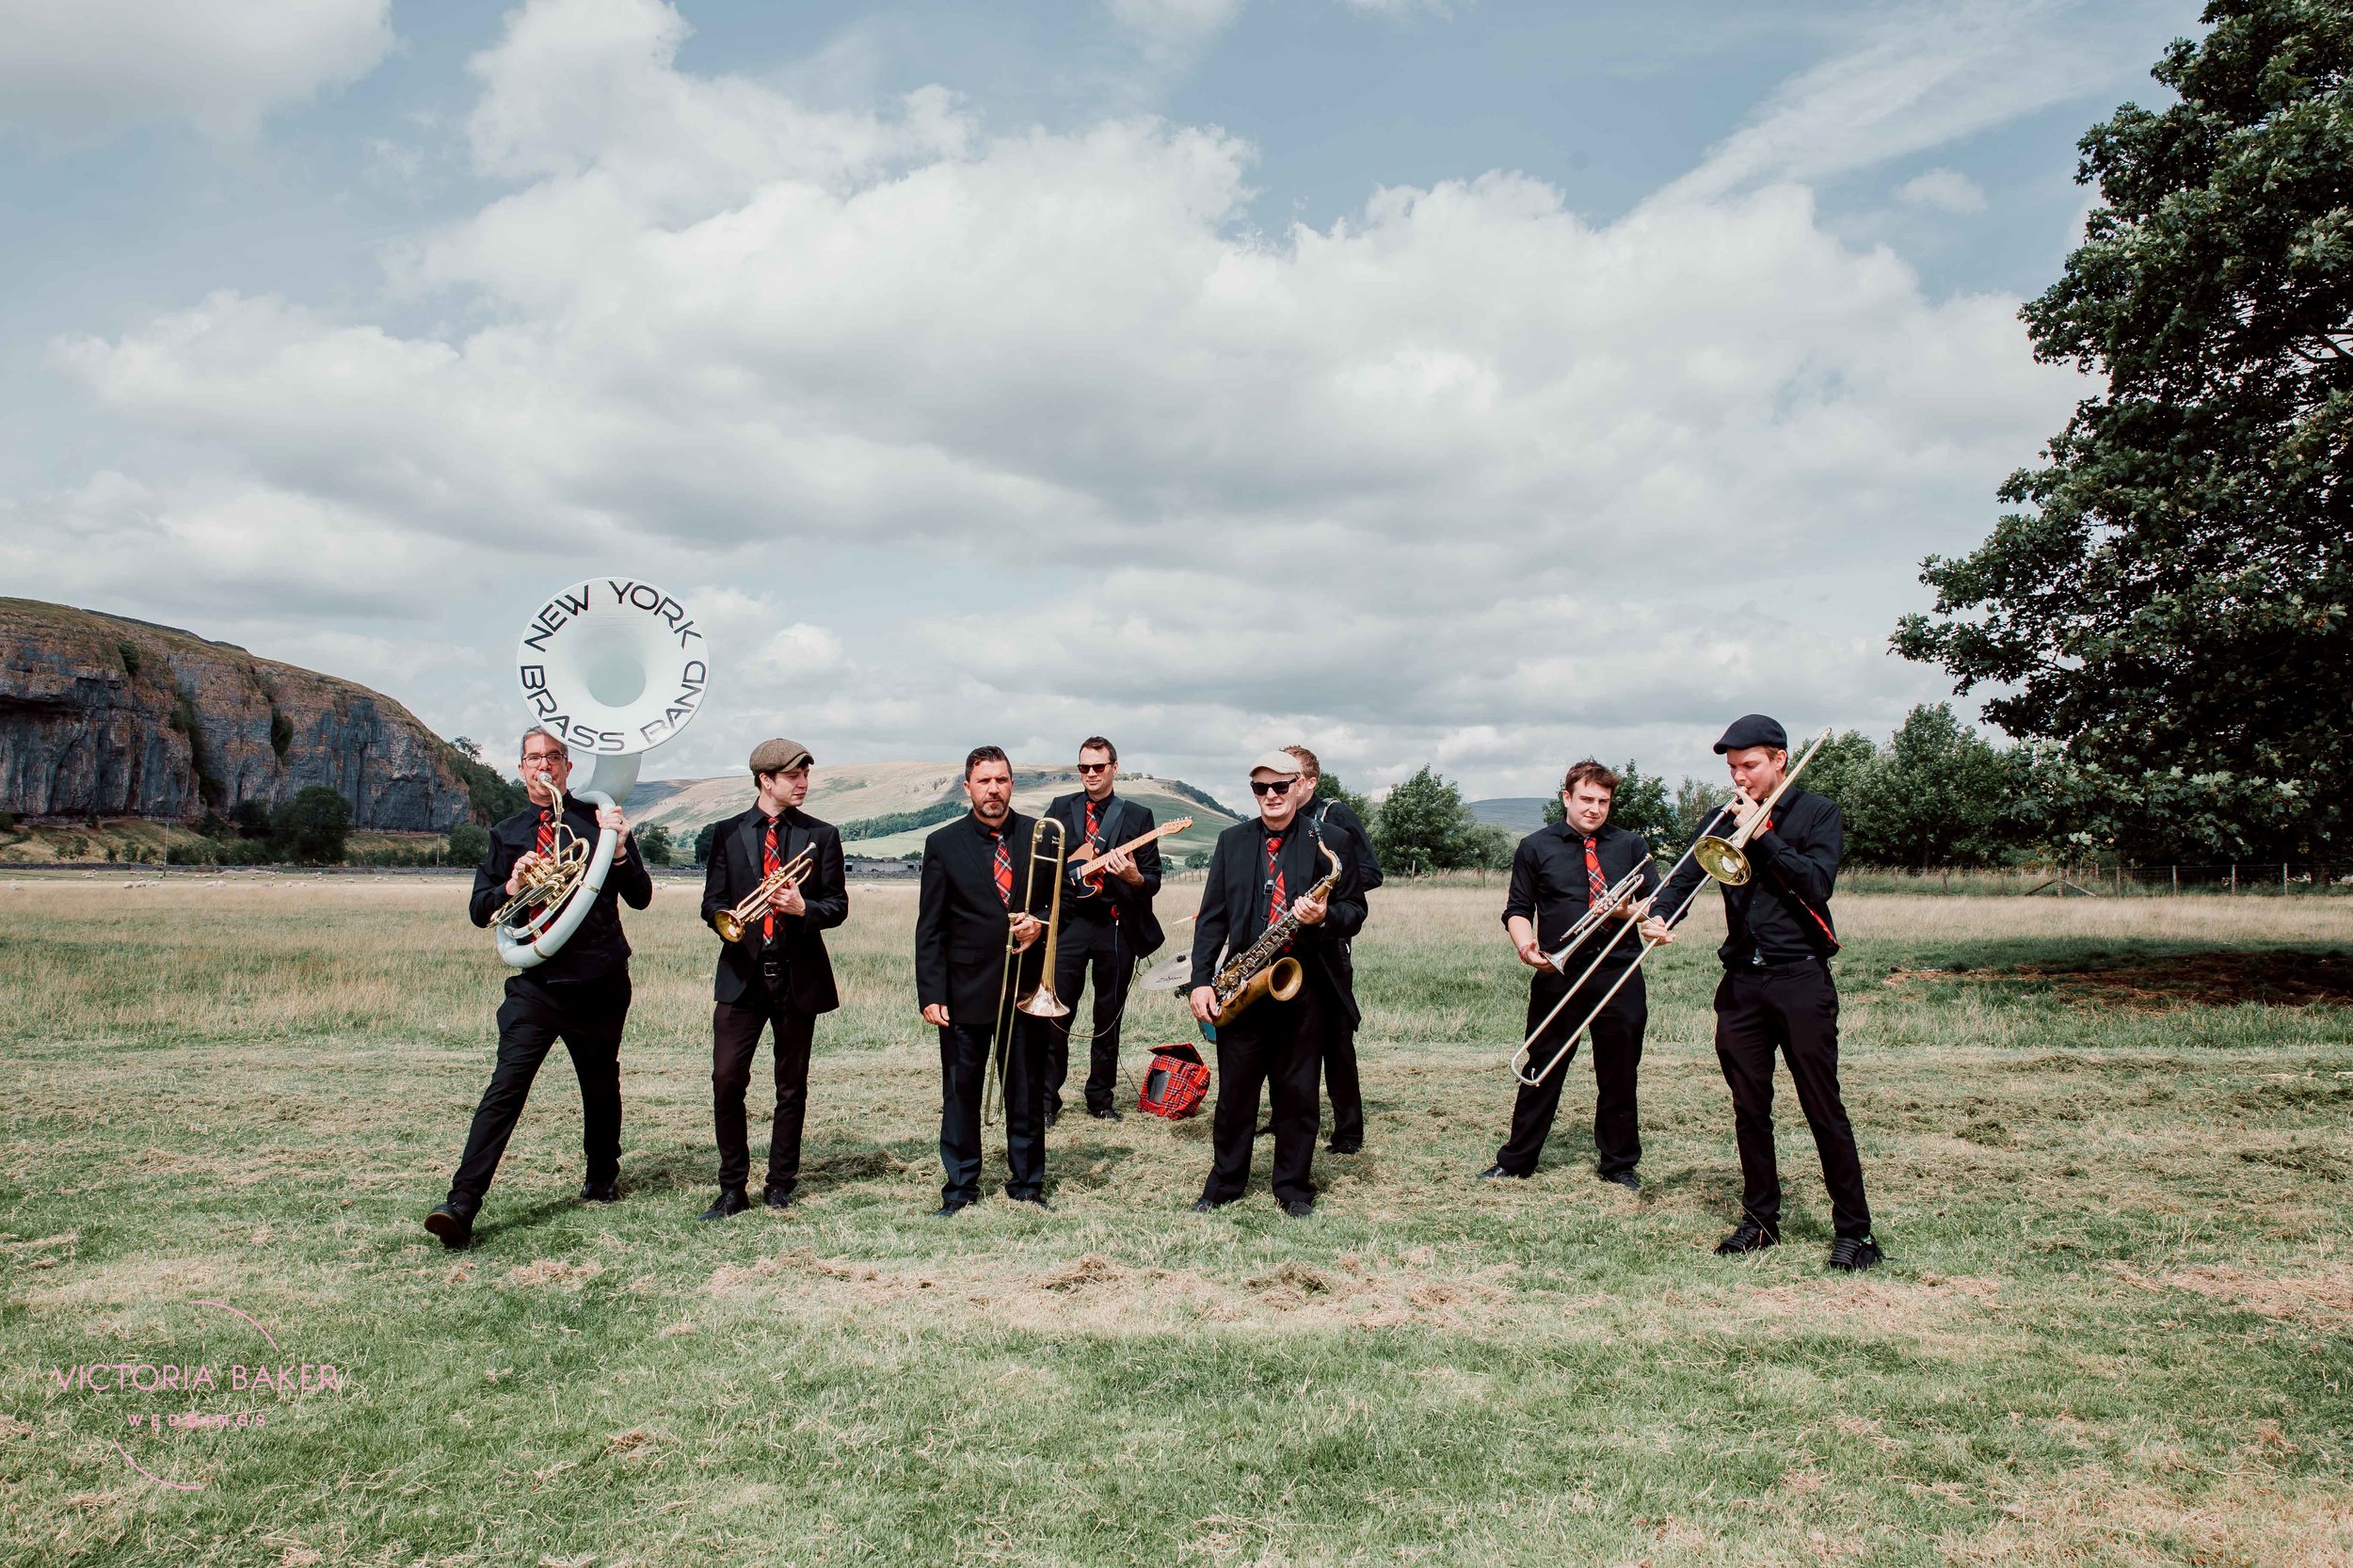 New York Brass Band at Kilnsey Park Estate